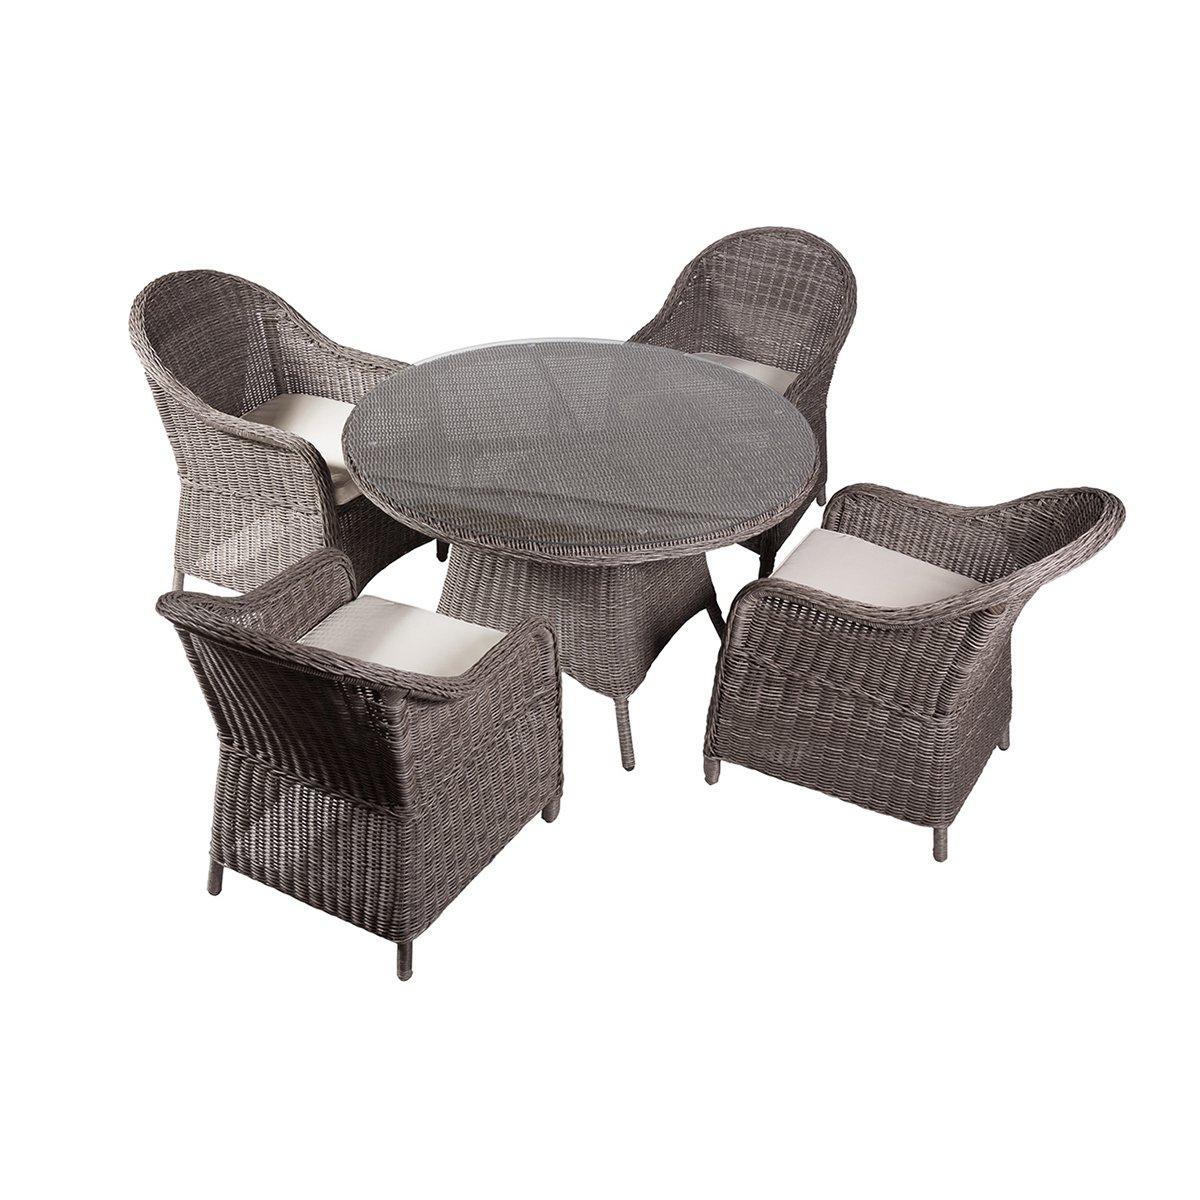 rattan gartengarnitur madison polyrattan gartenm bel terrassenm bel inkl sitzkissen grau. Black Bedroom Furniture Sets. Home Design Ideas